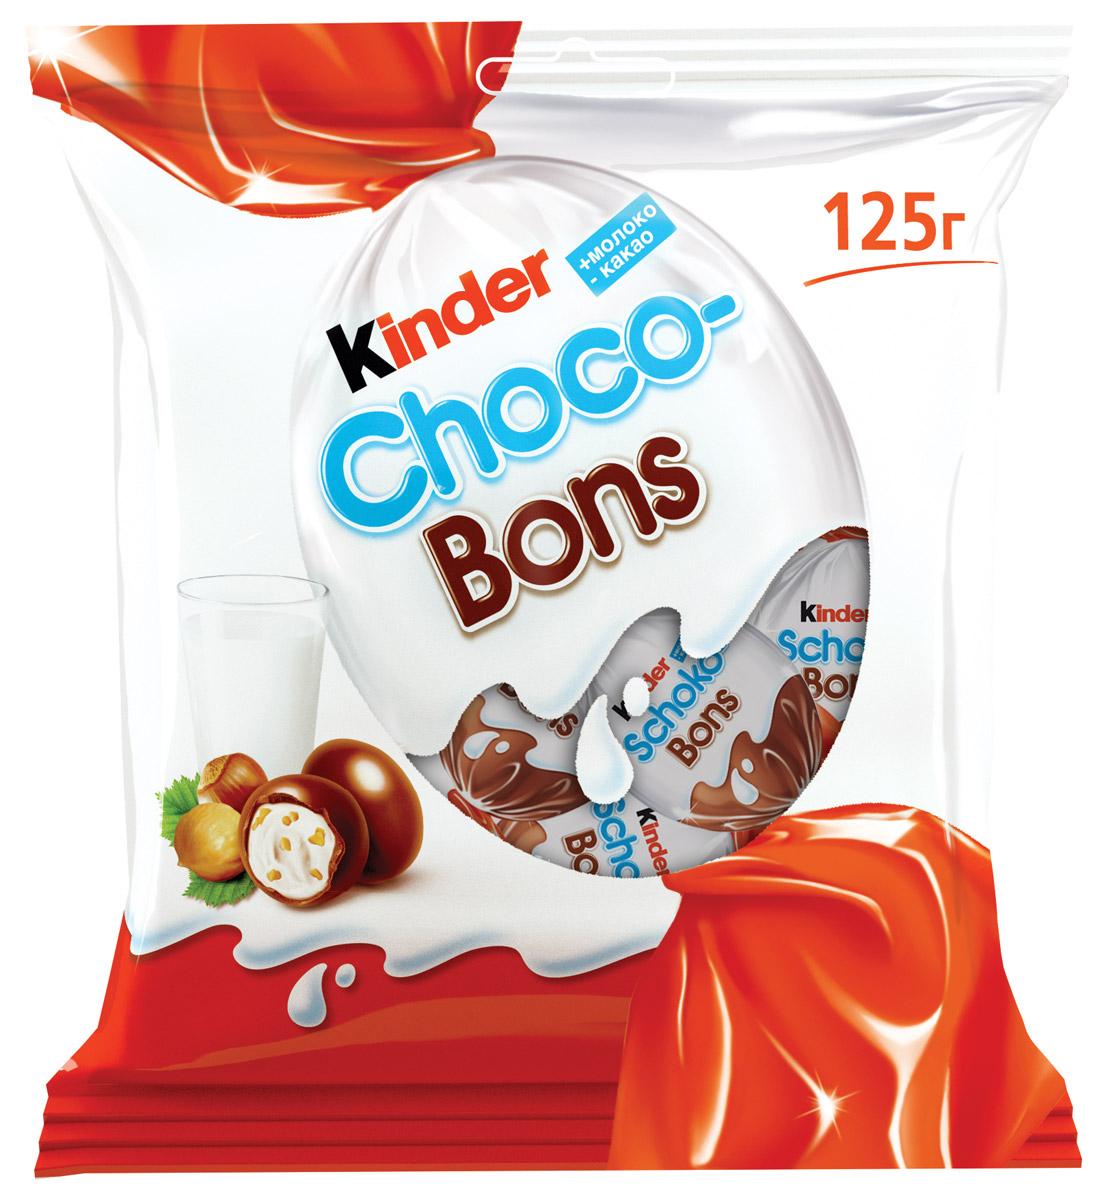 Kinder Choco Bons конфеты из молочного шоколада с молочно-ореховой начинкой, 125 г чехол для ноутбука 12 printio капитан америка